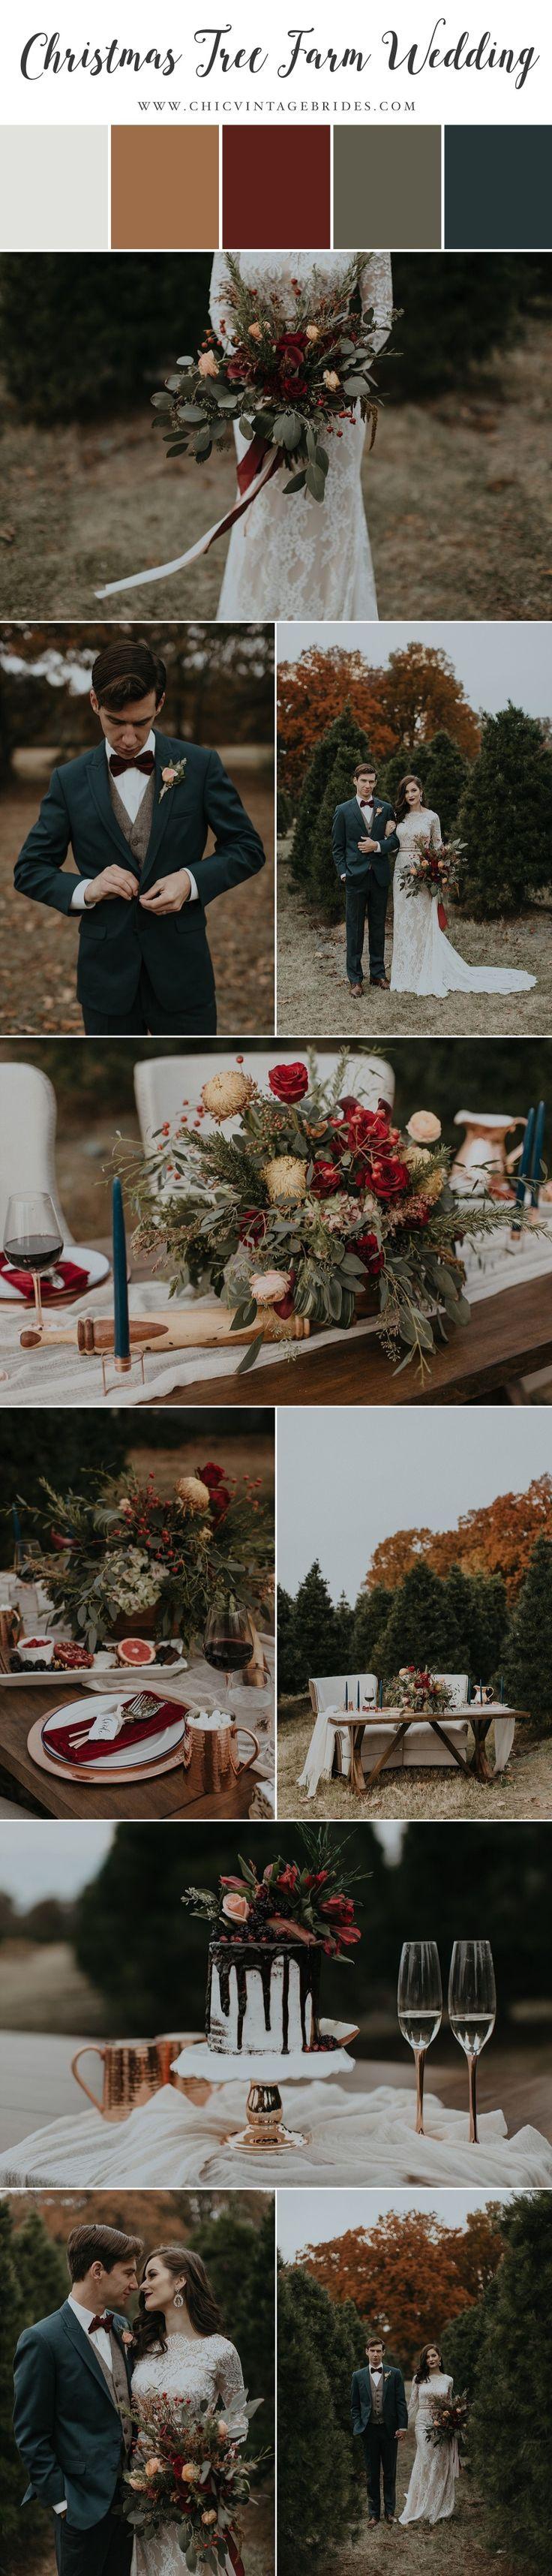 Modern-Vintage Christmas Tree Farm Wedding Inspiration in Garnet & Copper